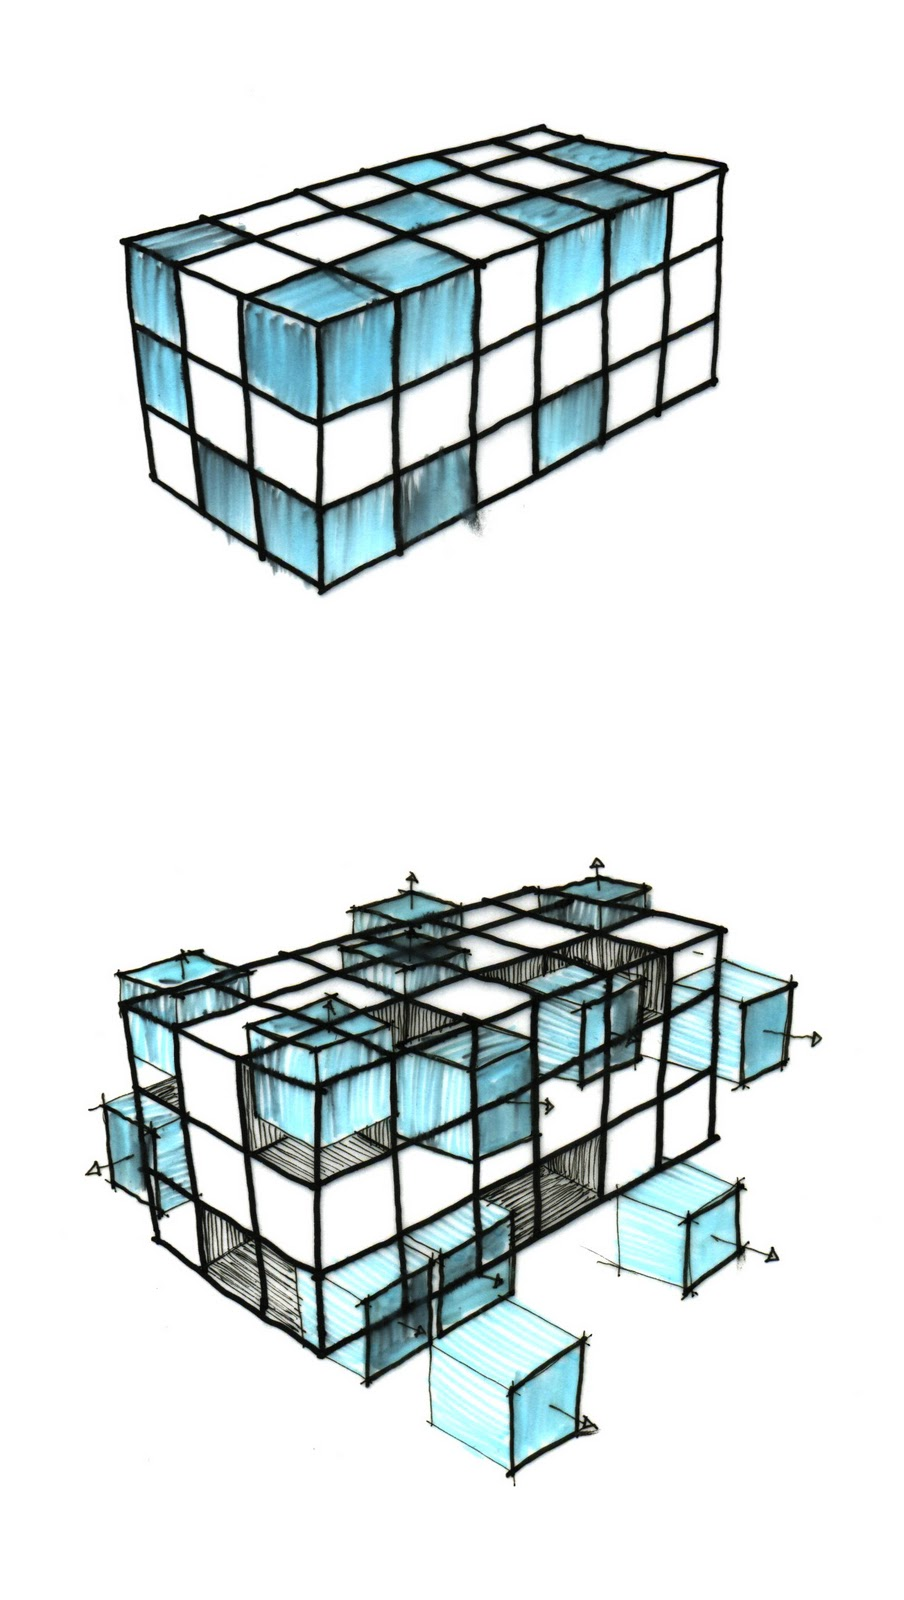 ADAM PARSONS DESIGN THESIS: DECONSTRUCTED RUBIK'S CUBE